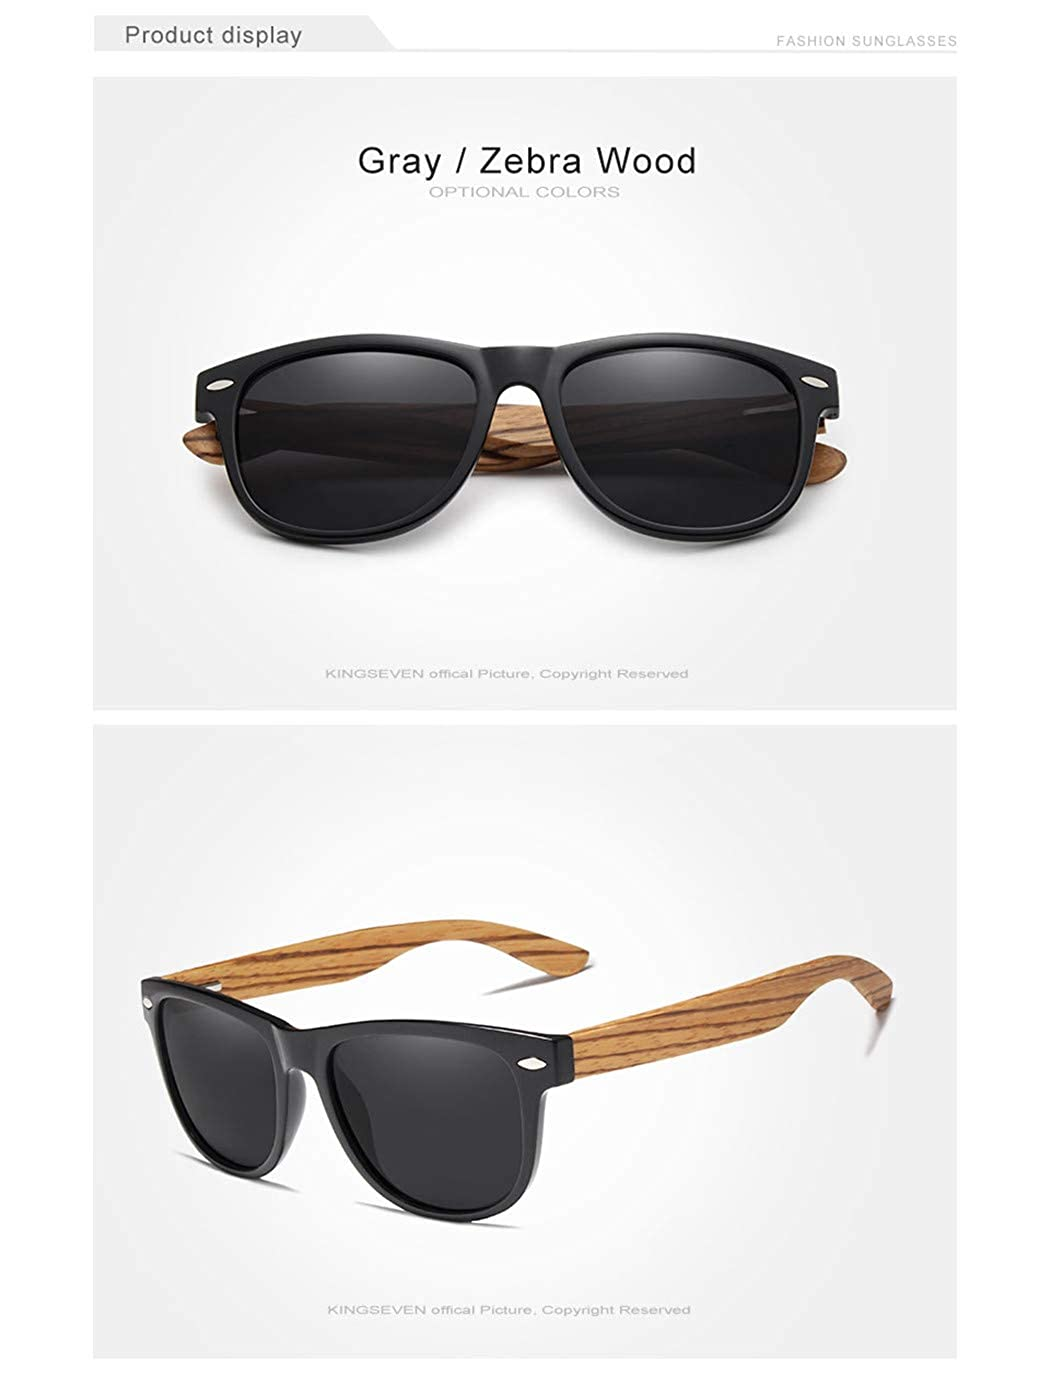 Polarized Square Sunglasses Men Women Mirror Lens UV400 Protection Driving Sun Glasses black